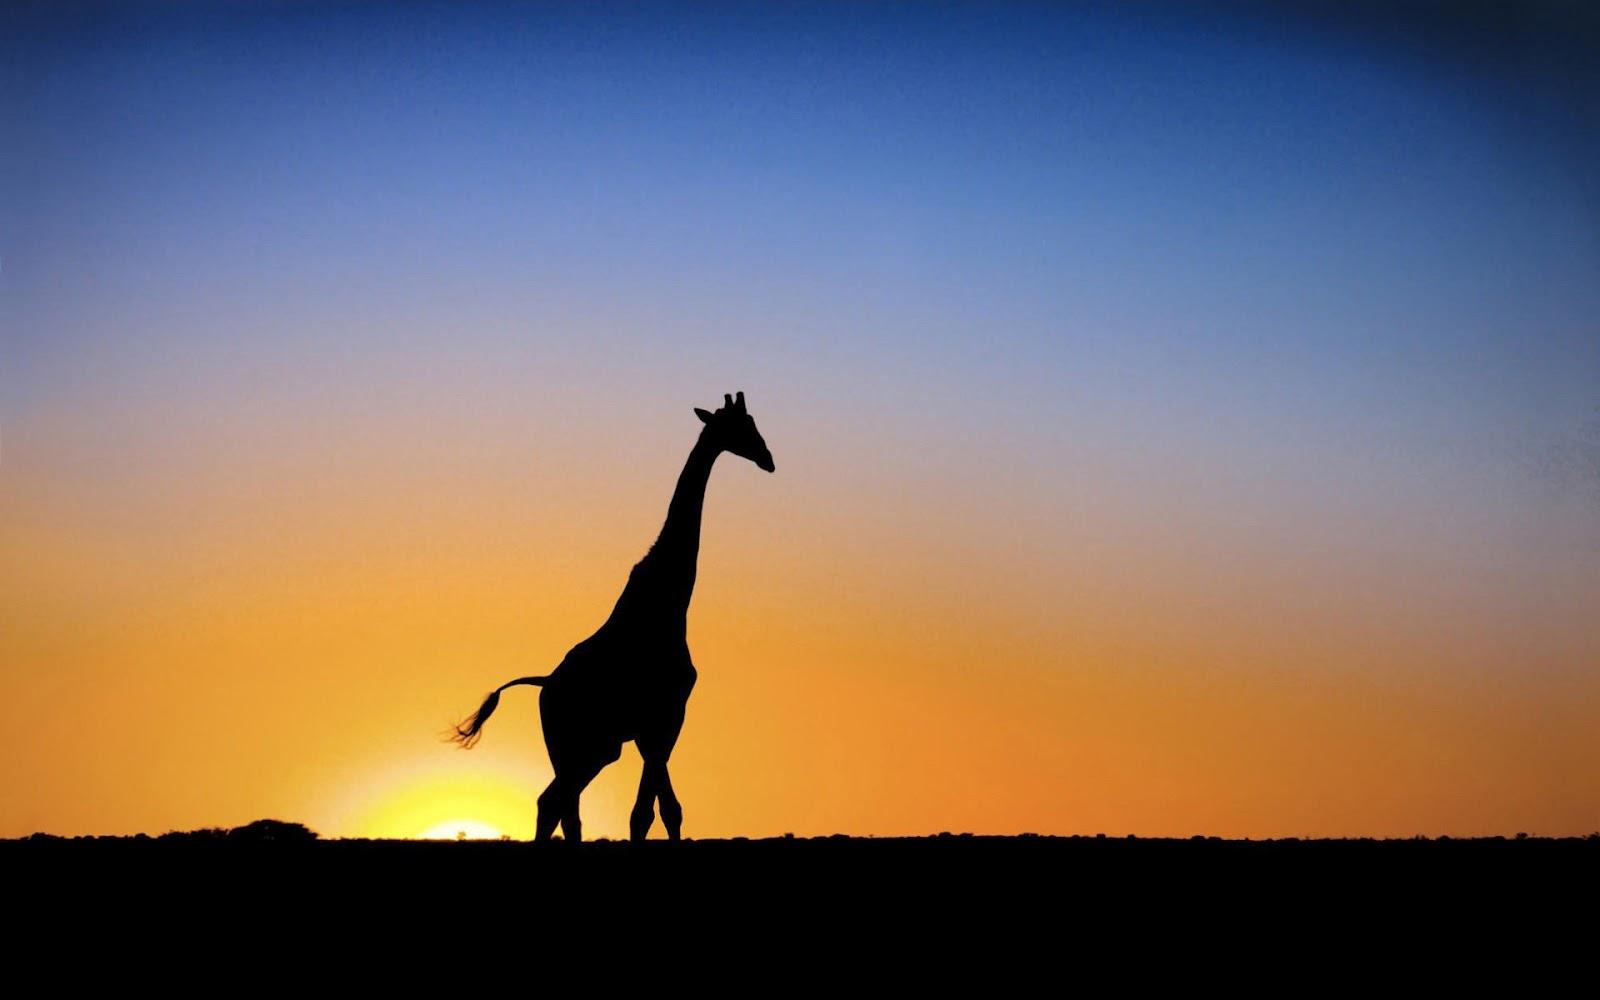 HD Giraffes Wallpapers And Photos